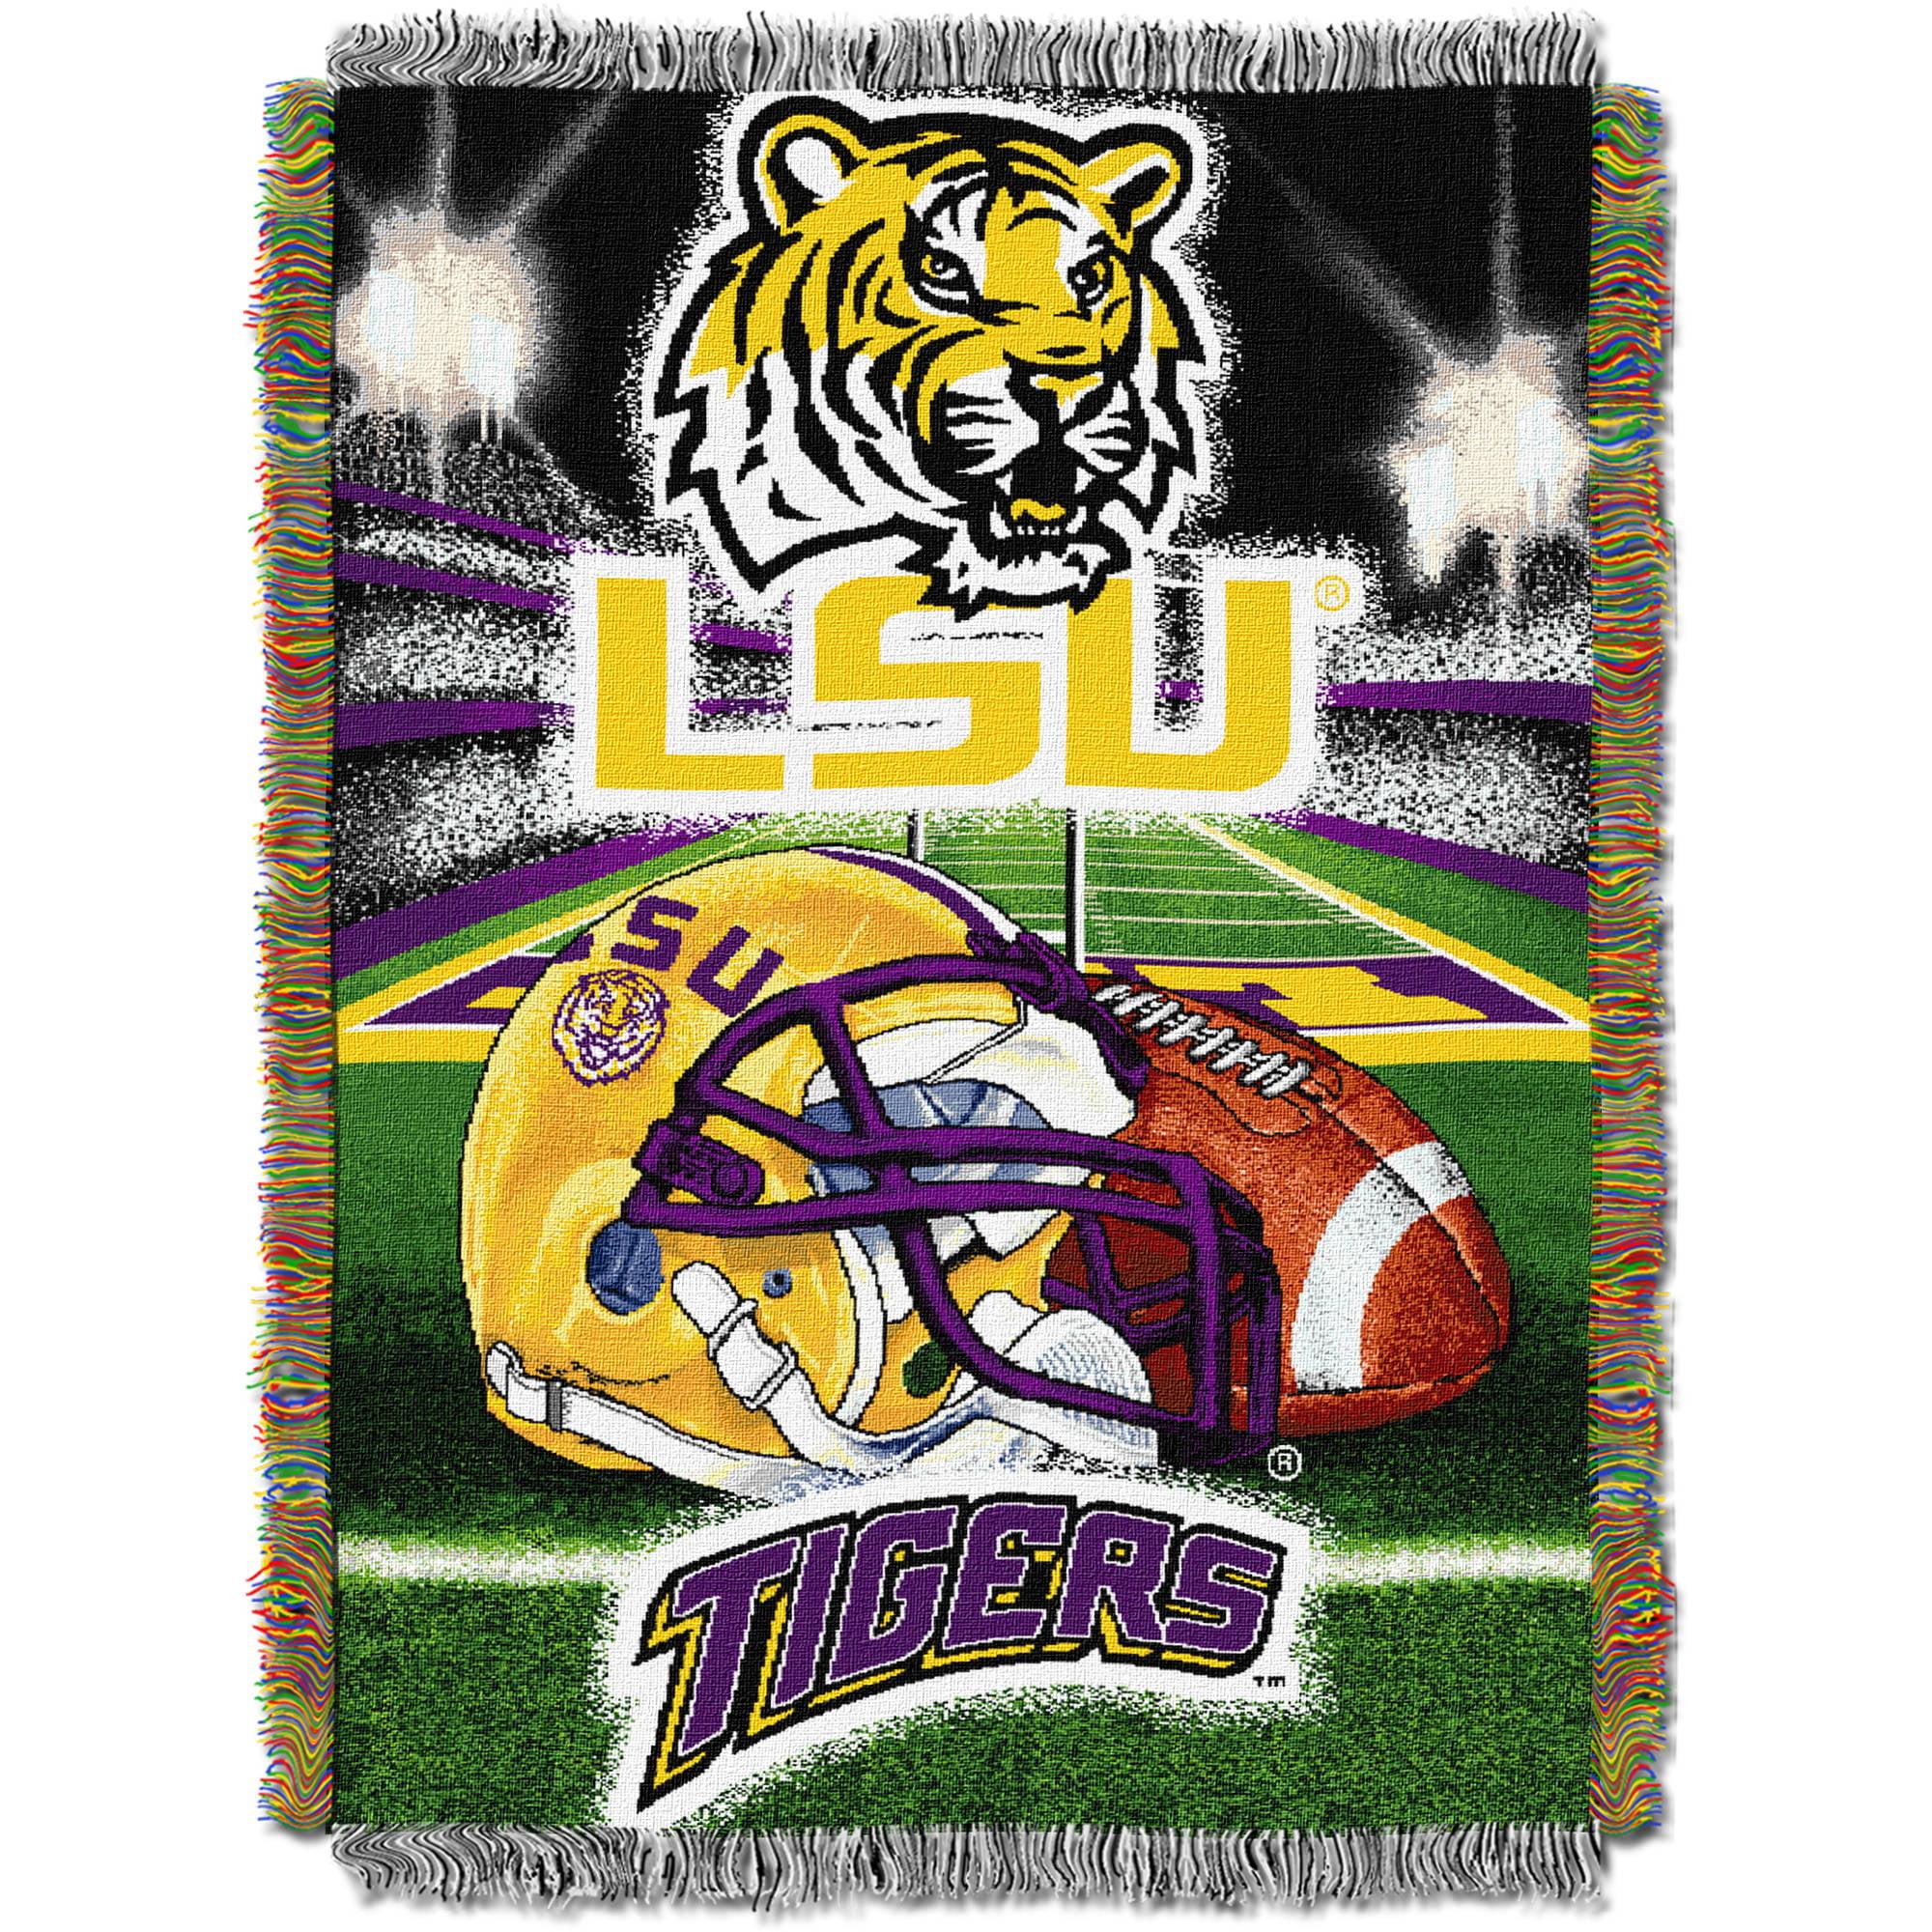 "NCAA 48"" x 60"" Tapestry Throw Home Field Advantage Series- LSU"